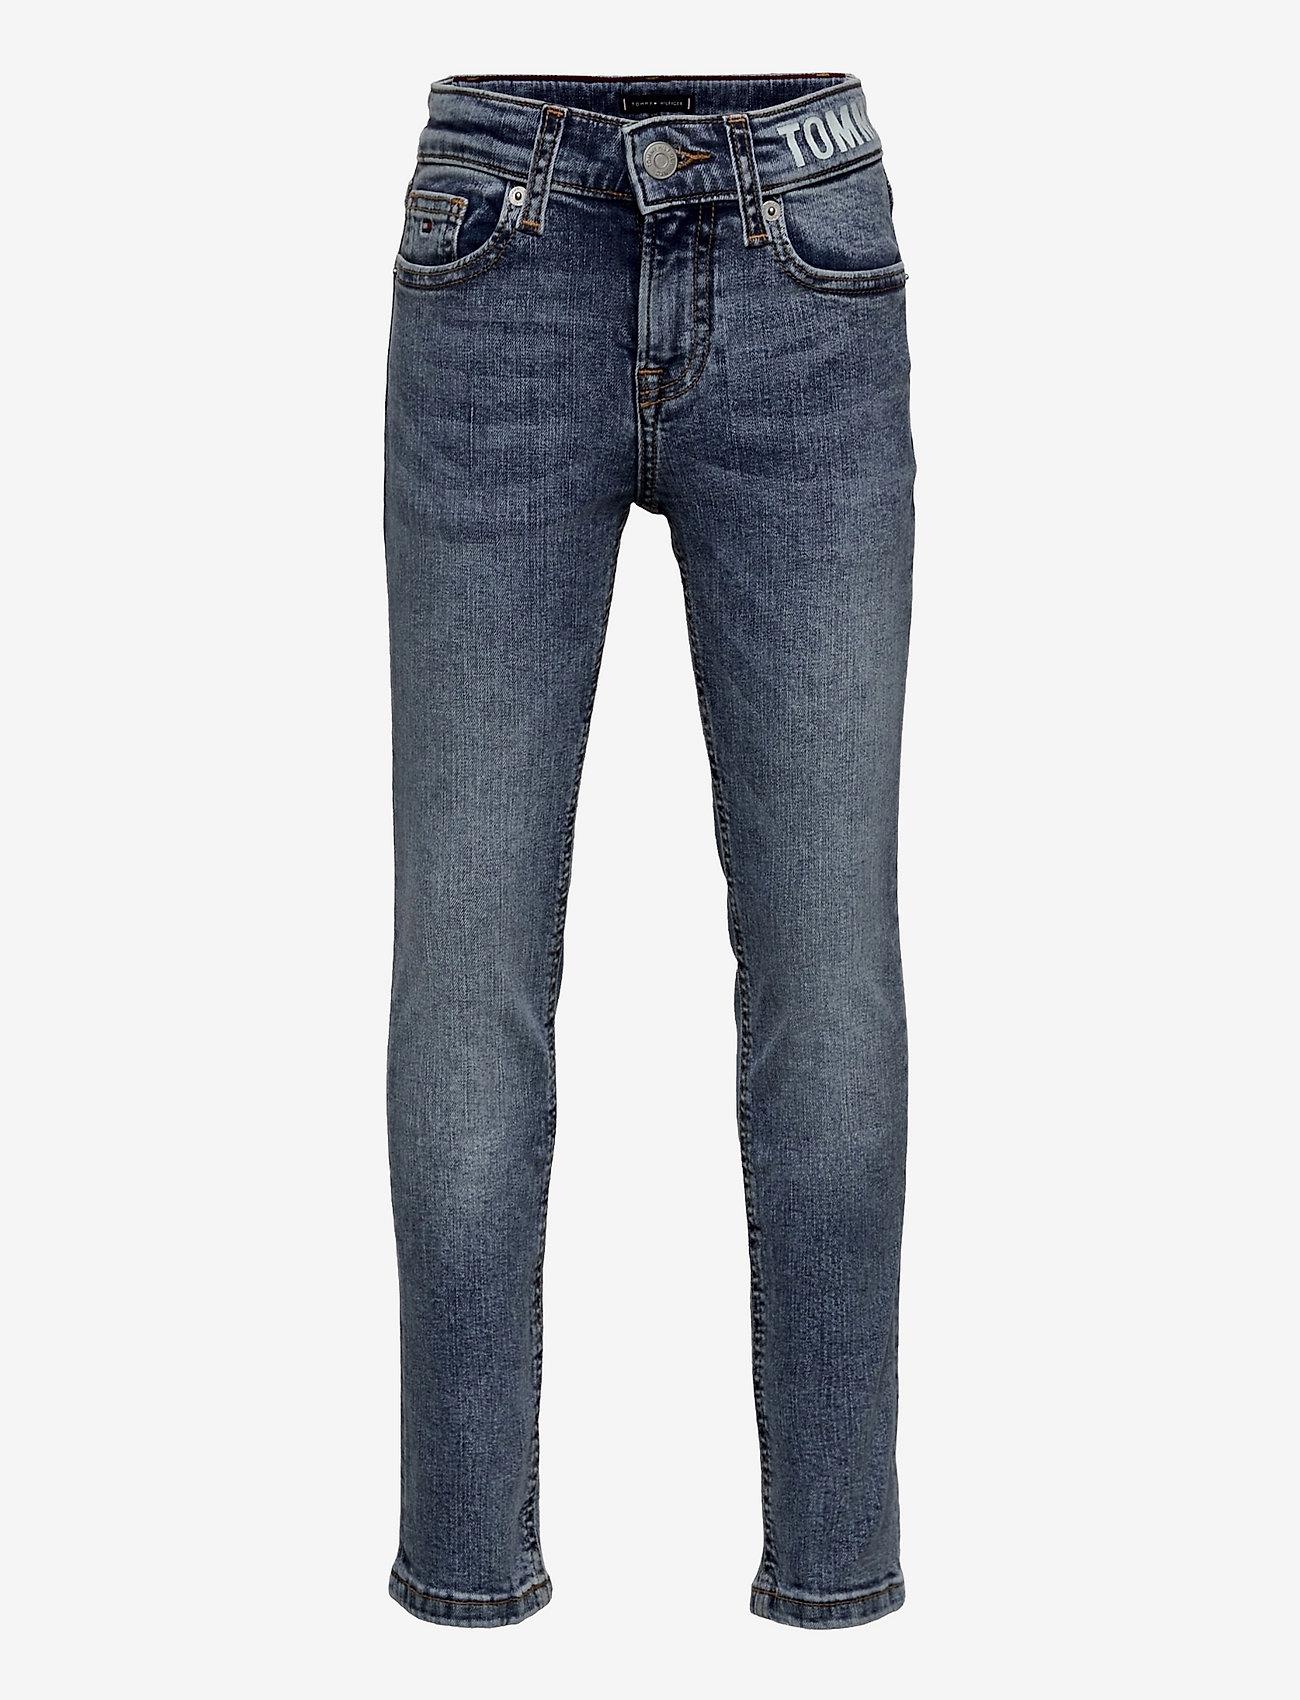 Tommy Hilfiger - SCANTON SLIM WAISTBAND PRINT - jeans - saltpepperlttstr - 0